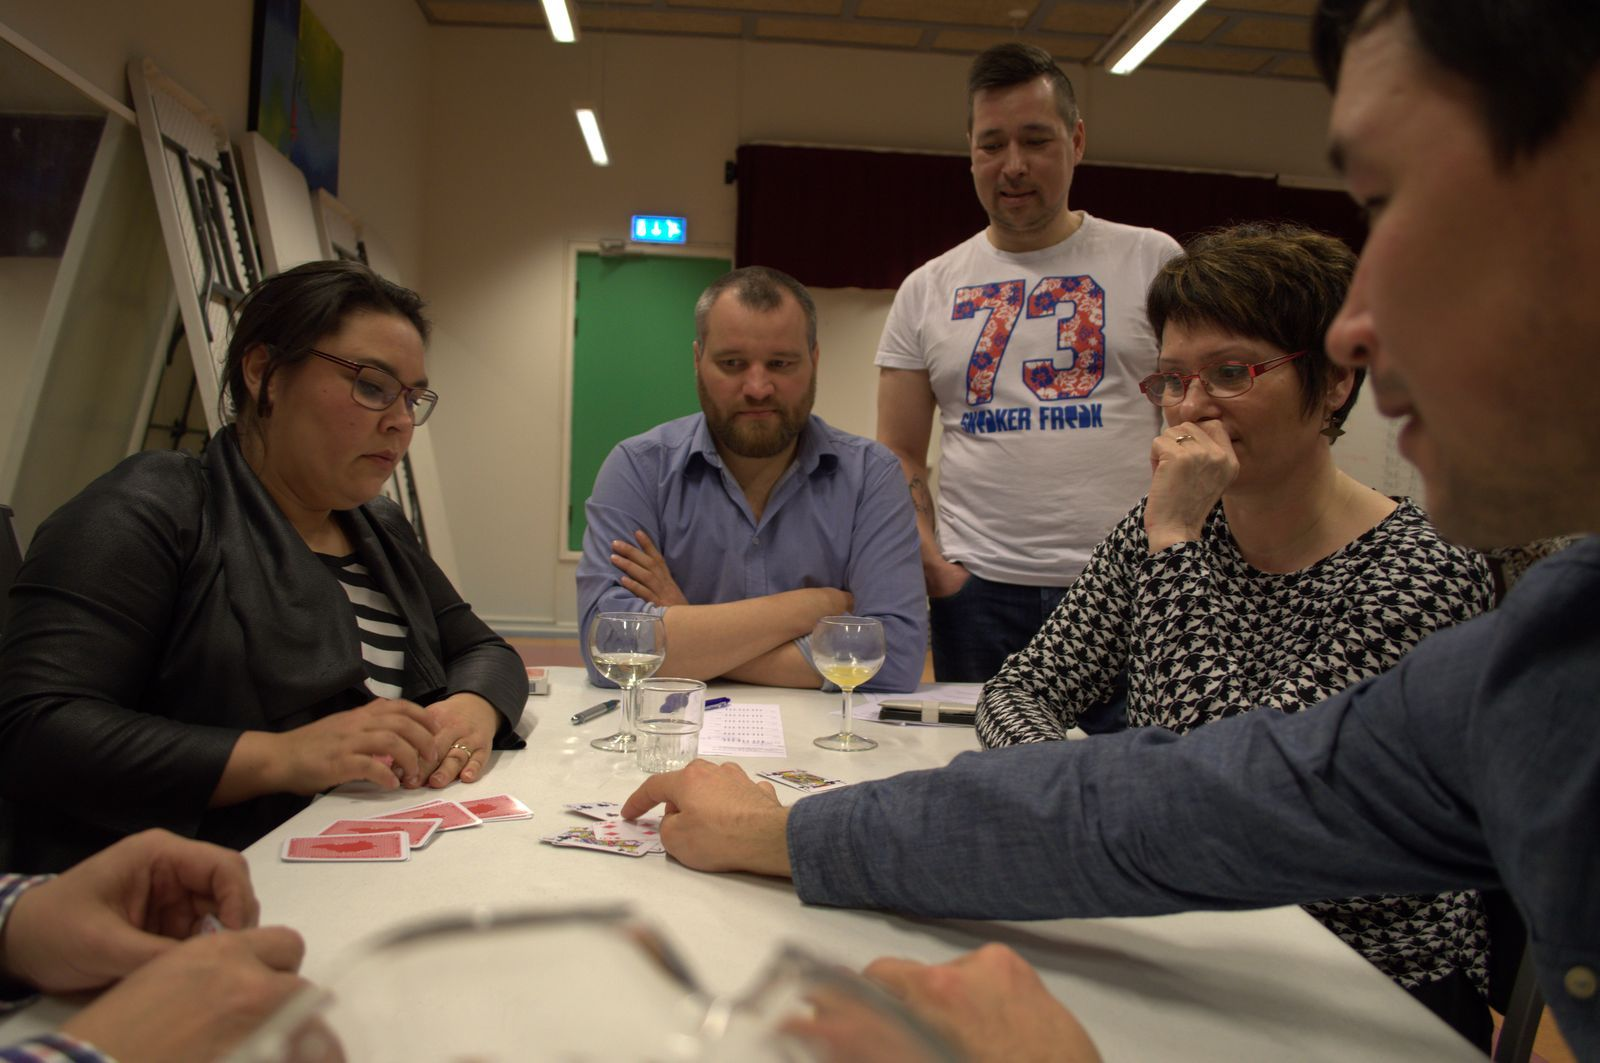 2015-03-08-0020_Semifinalen_spilles_Worms_3